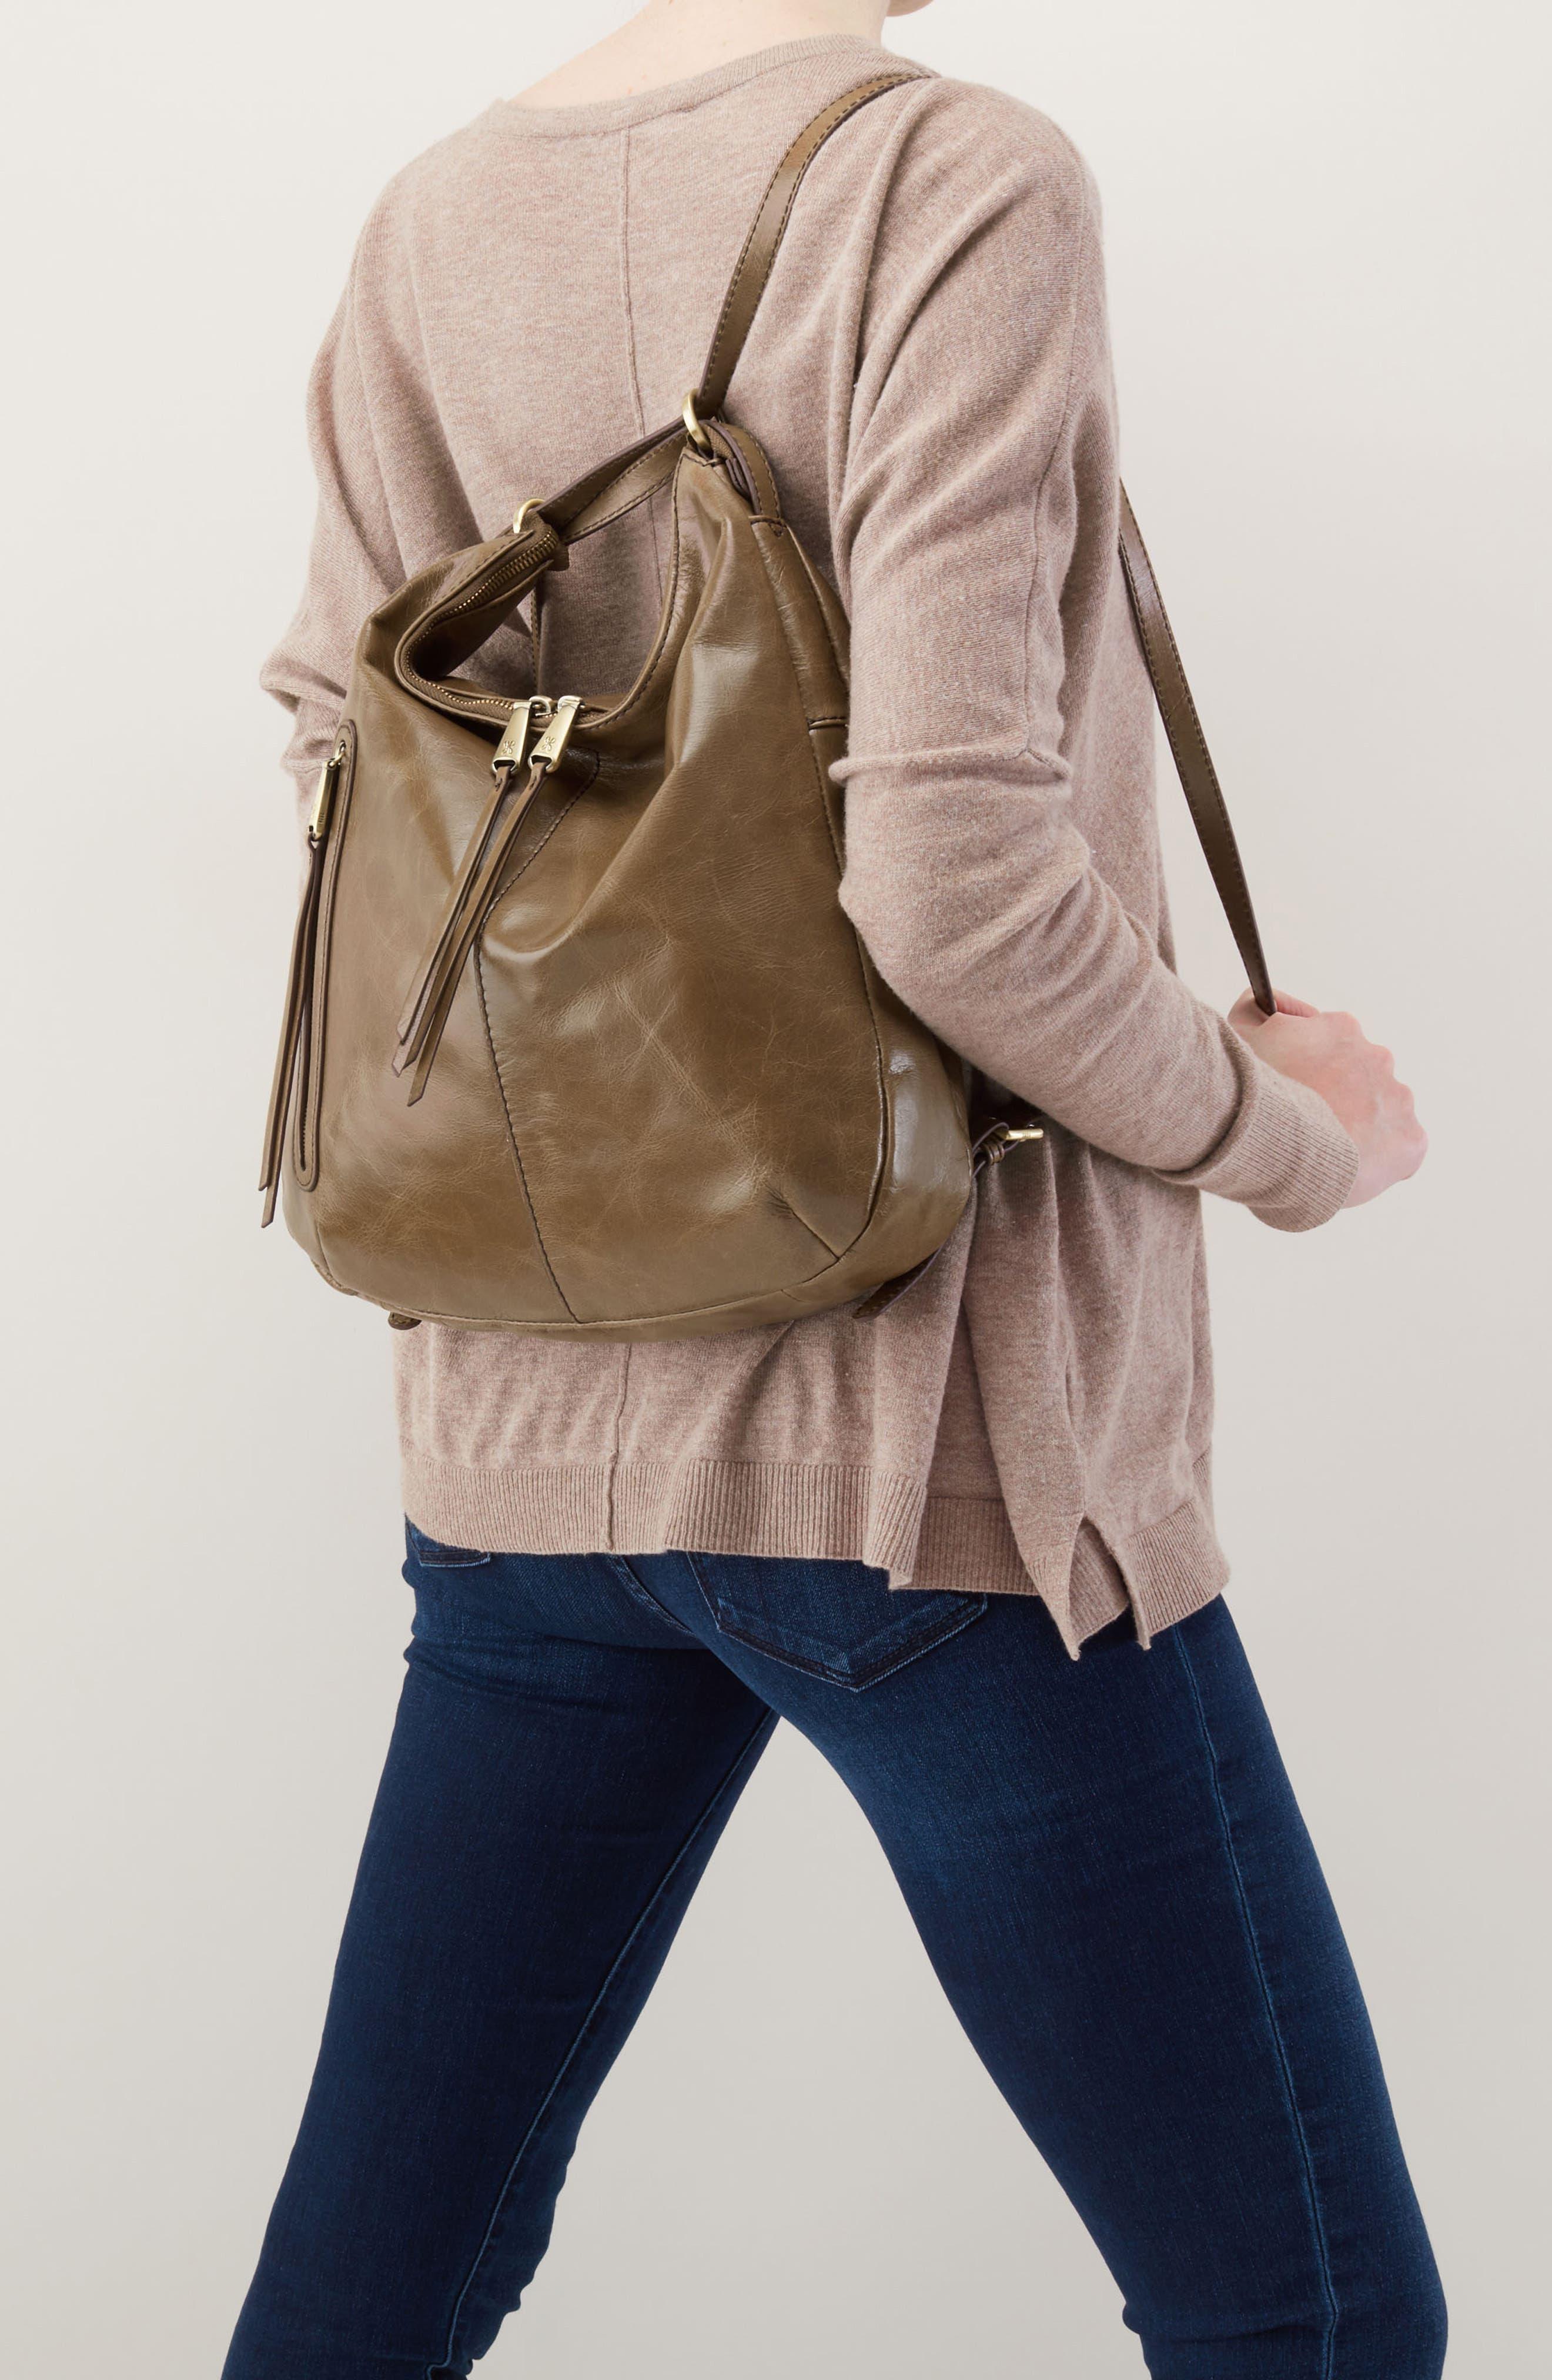 Merrin Leather Backpack,                             Alternate thumbnail 4, color,                             MINK